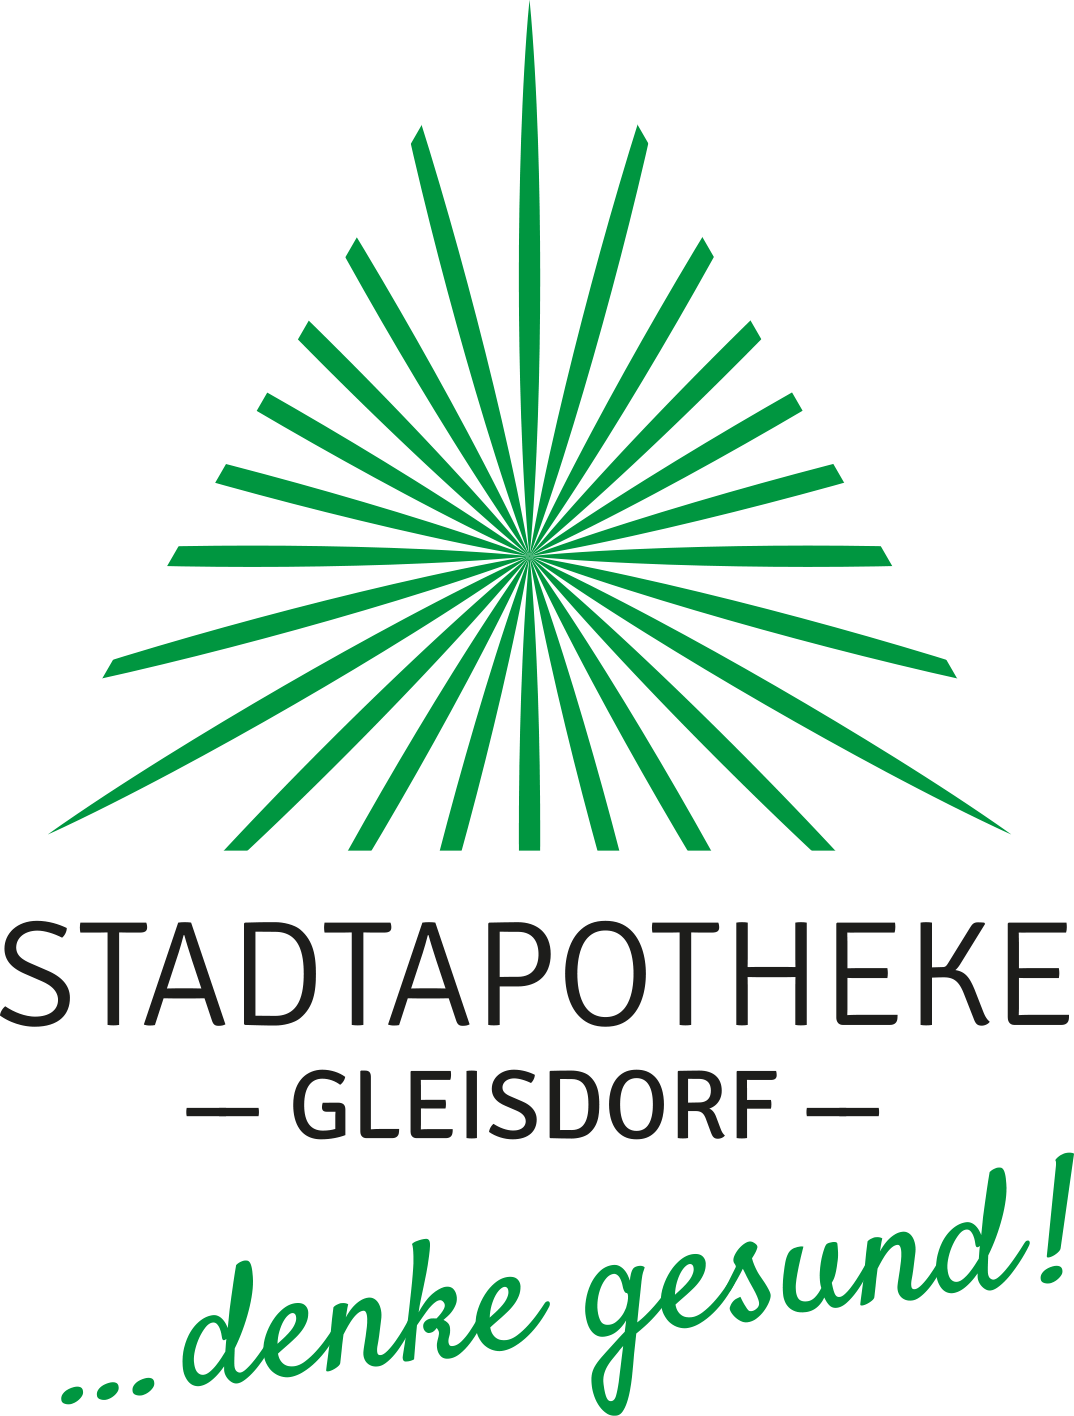 Stadtapotheke Gleisdorf